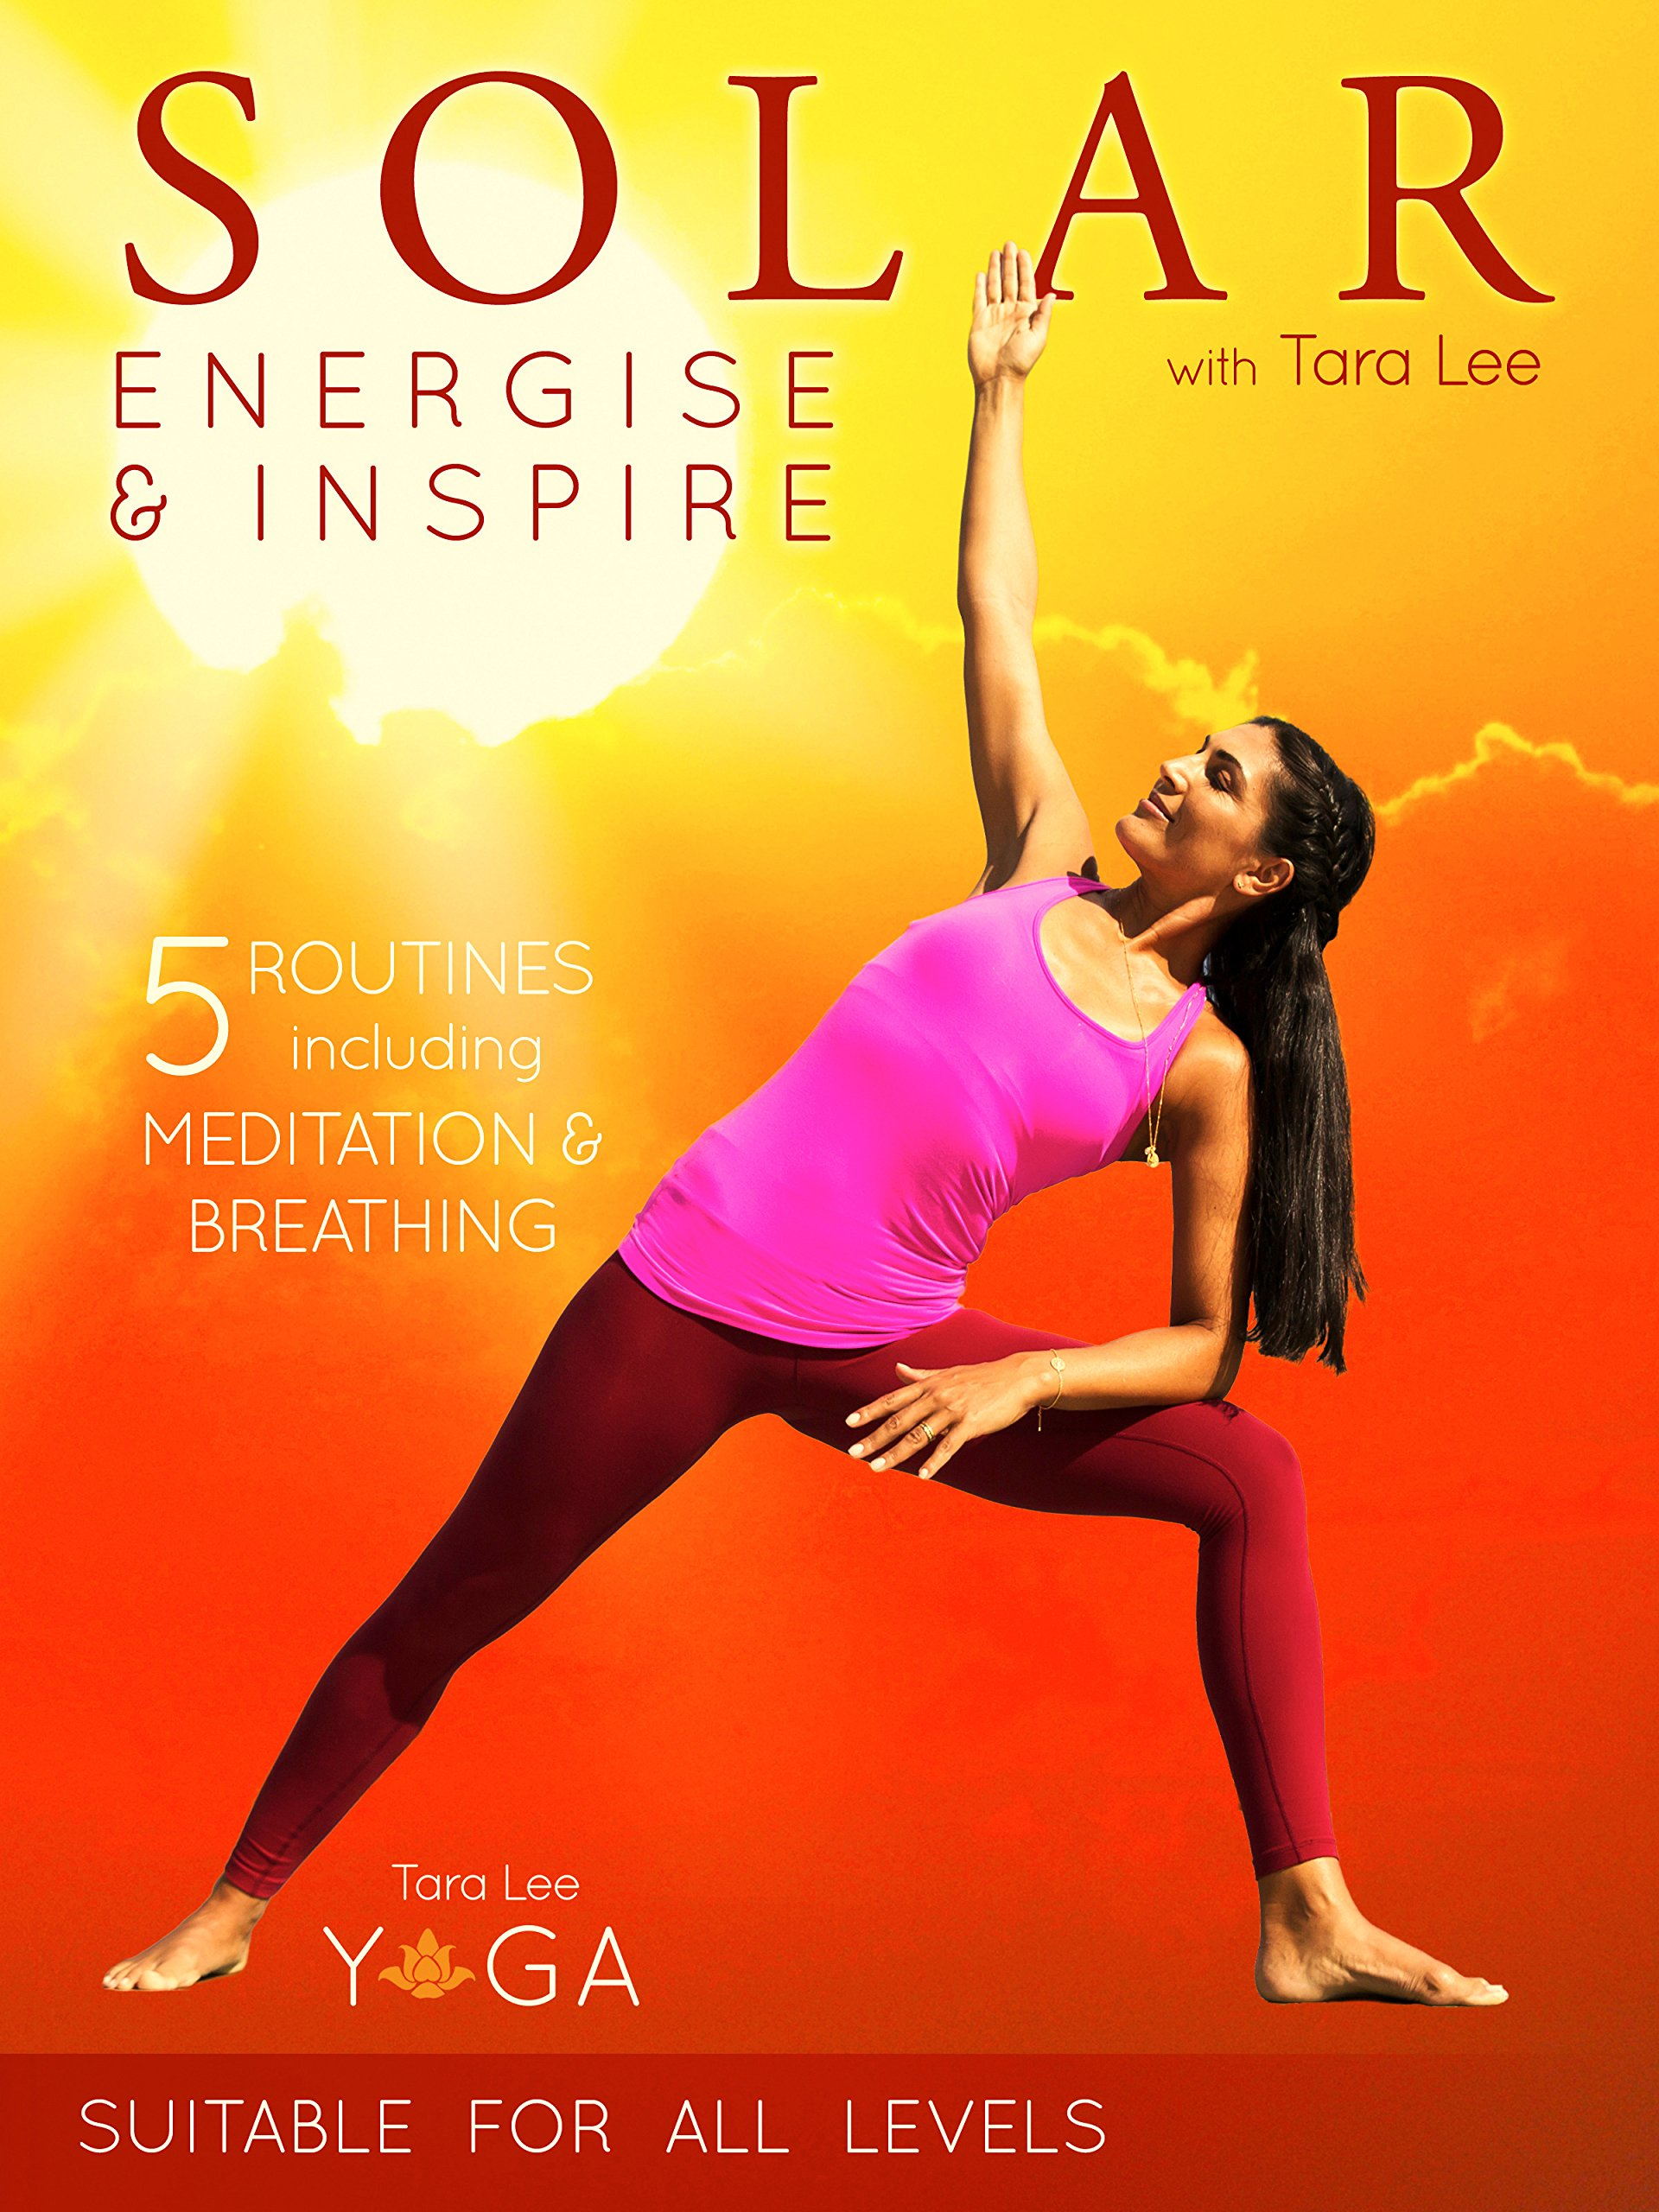 Solar: Energise & Inspire Yoga with Tara Lee